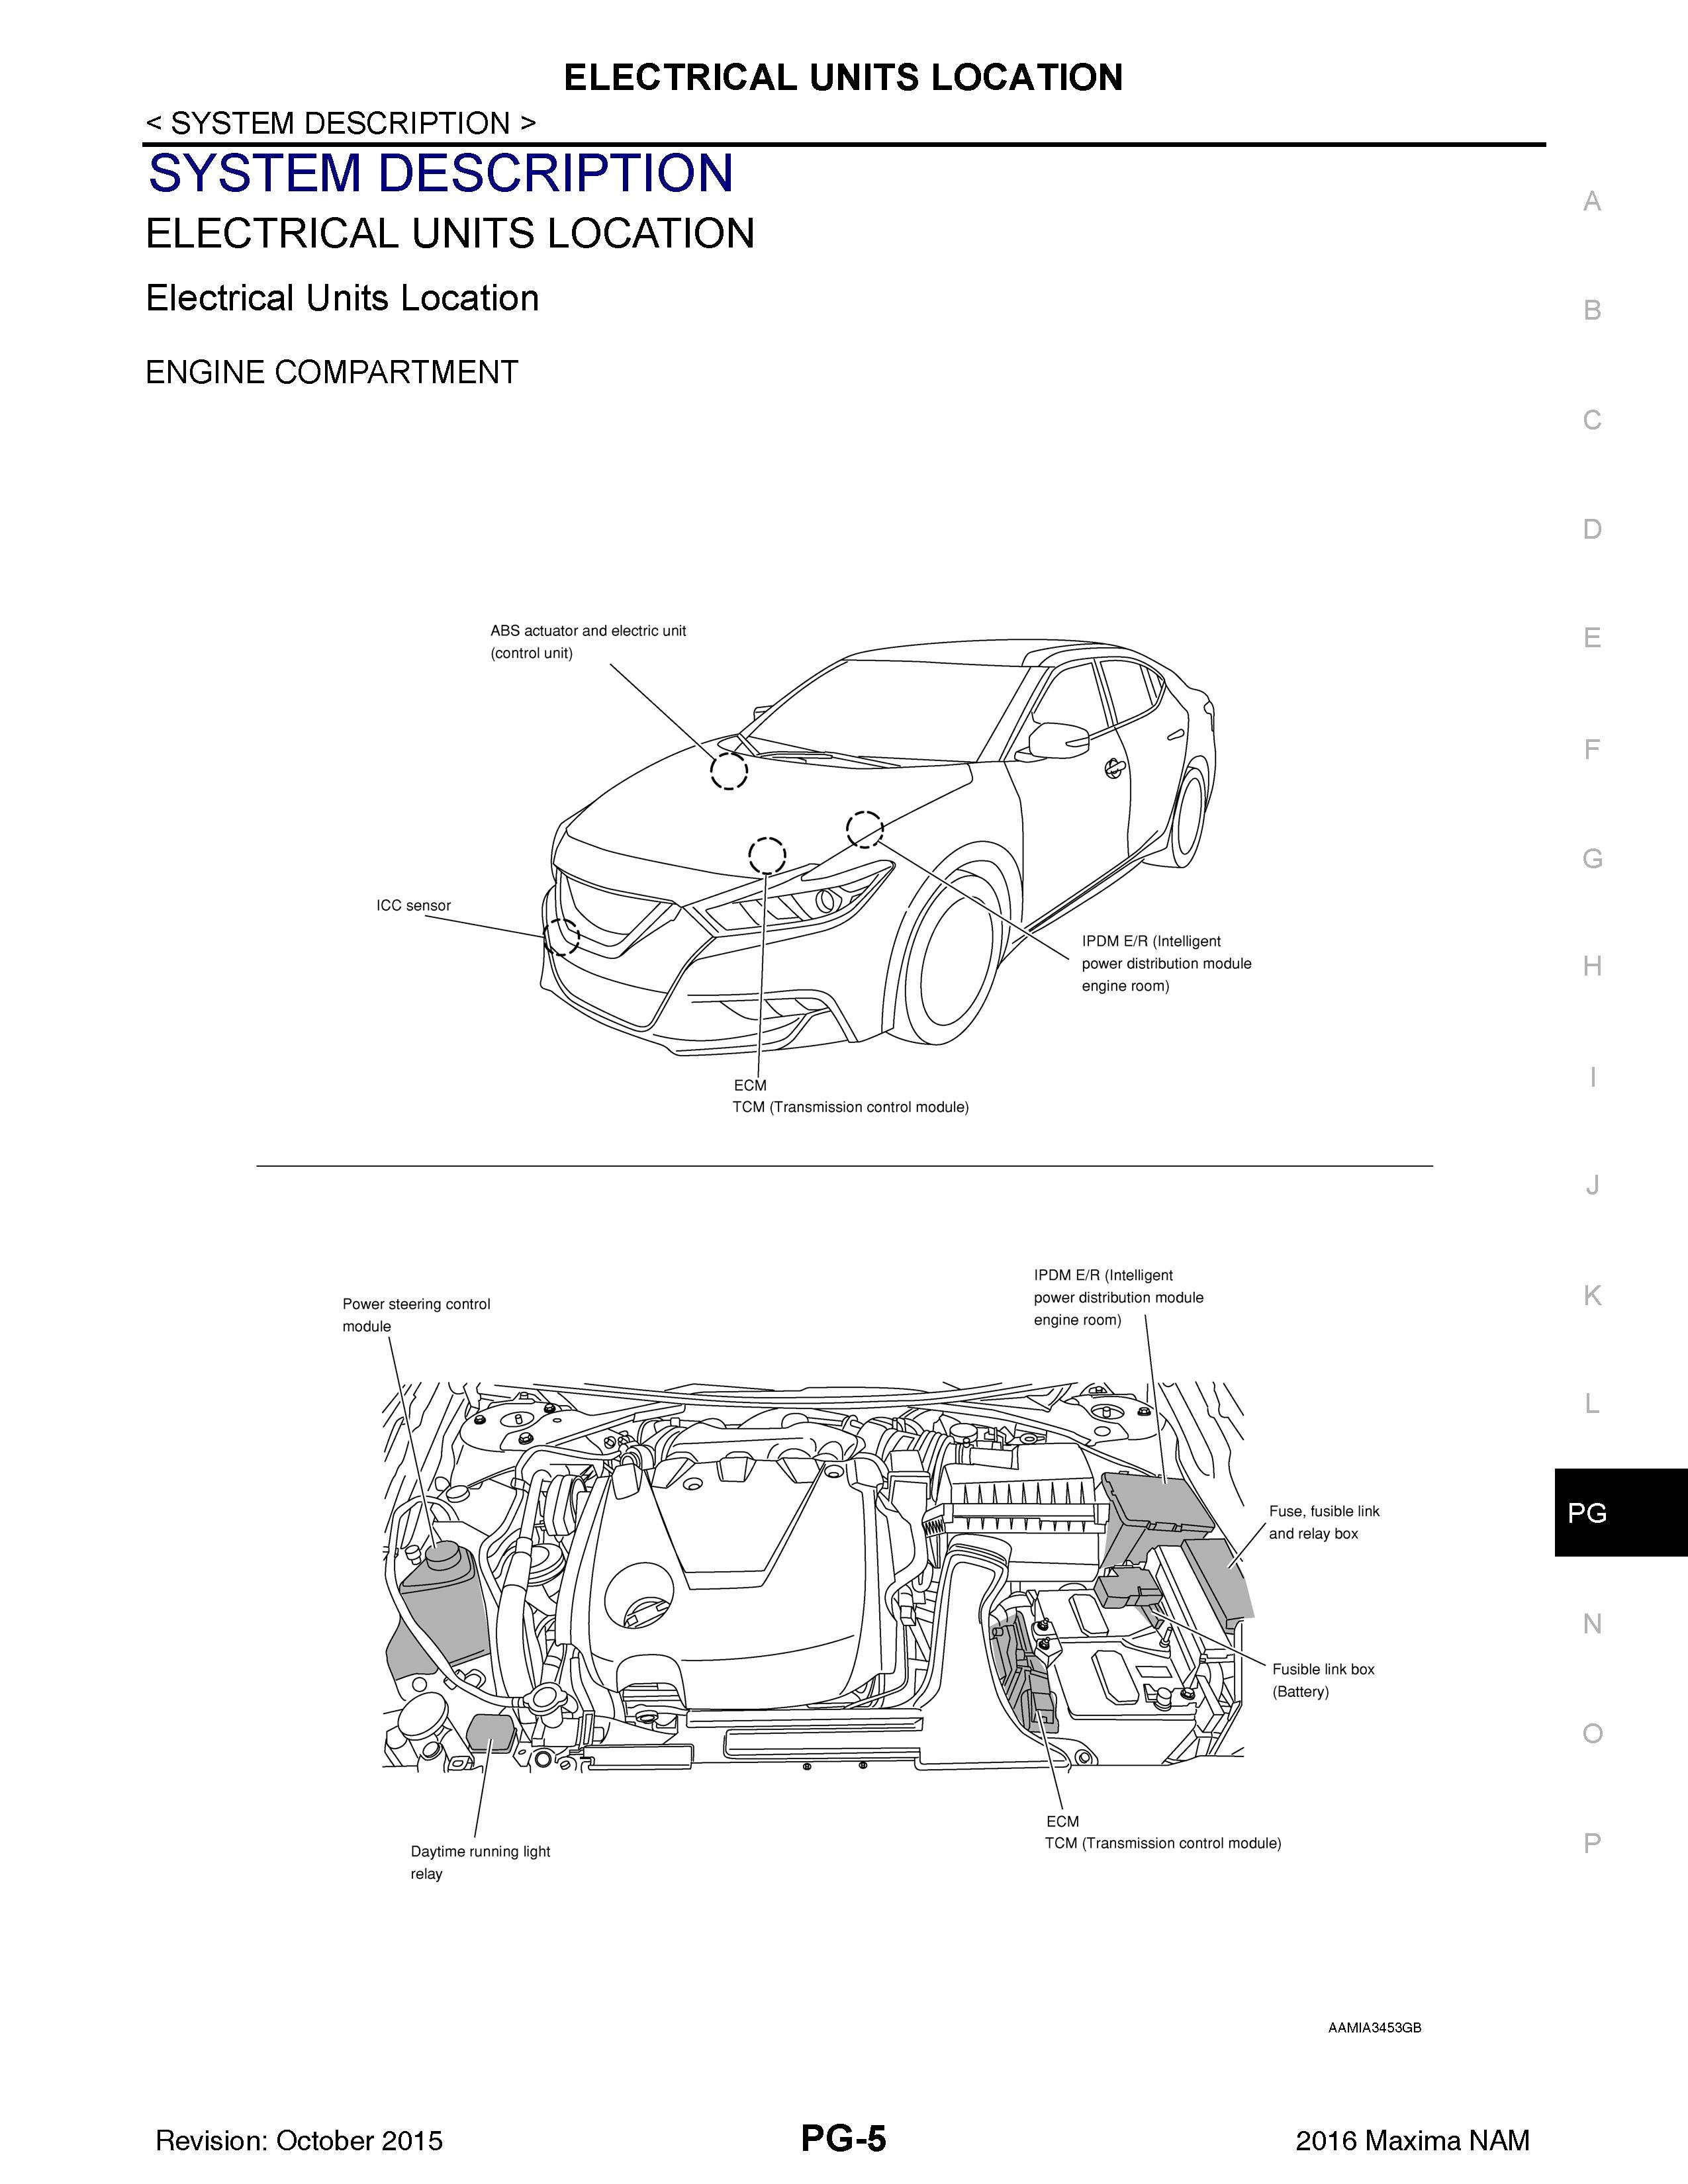 Nissan Teana Engine Diagram Get Free Image About Wiring Diagram